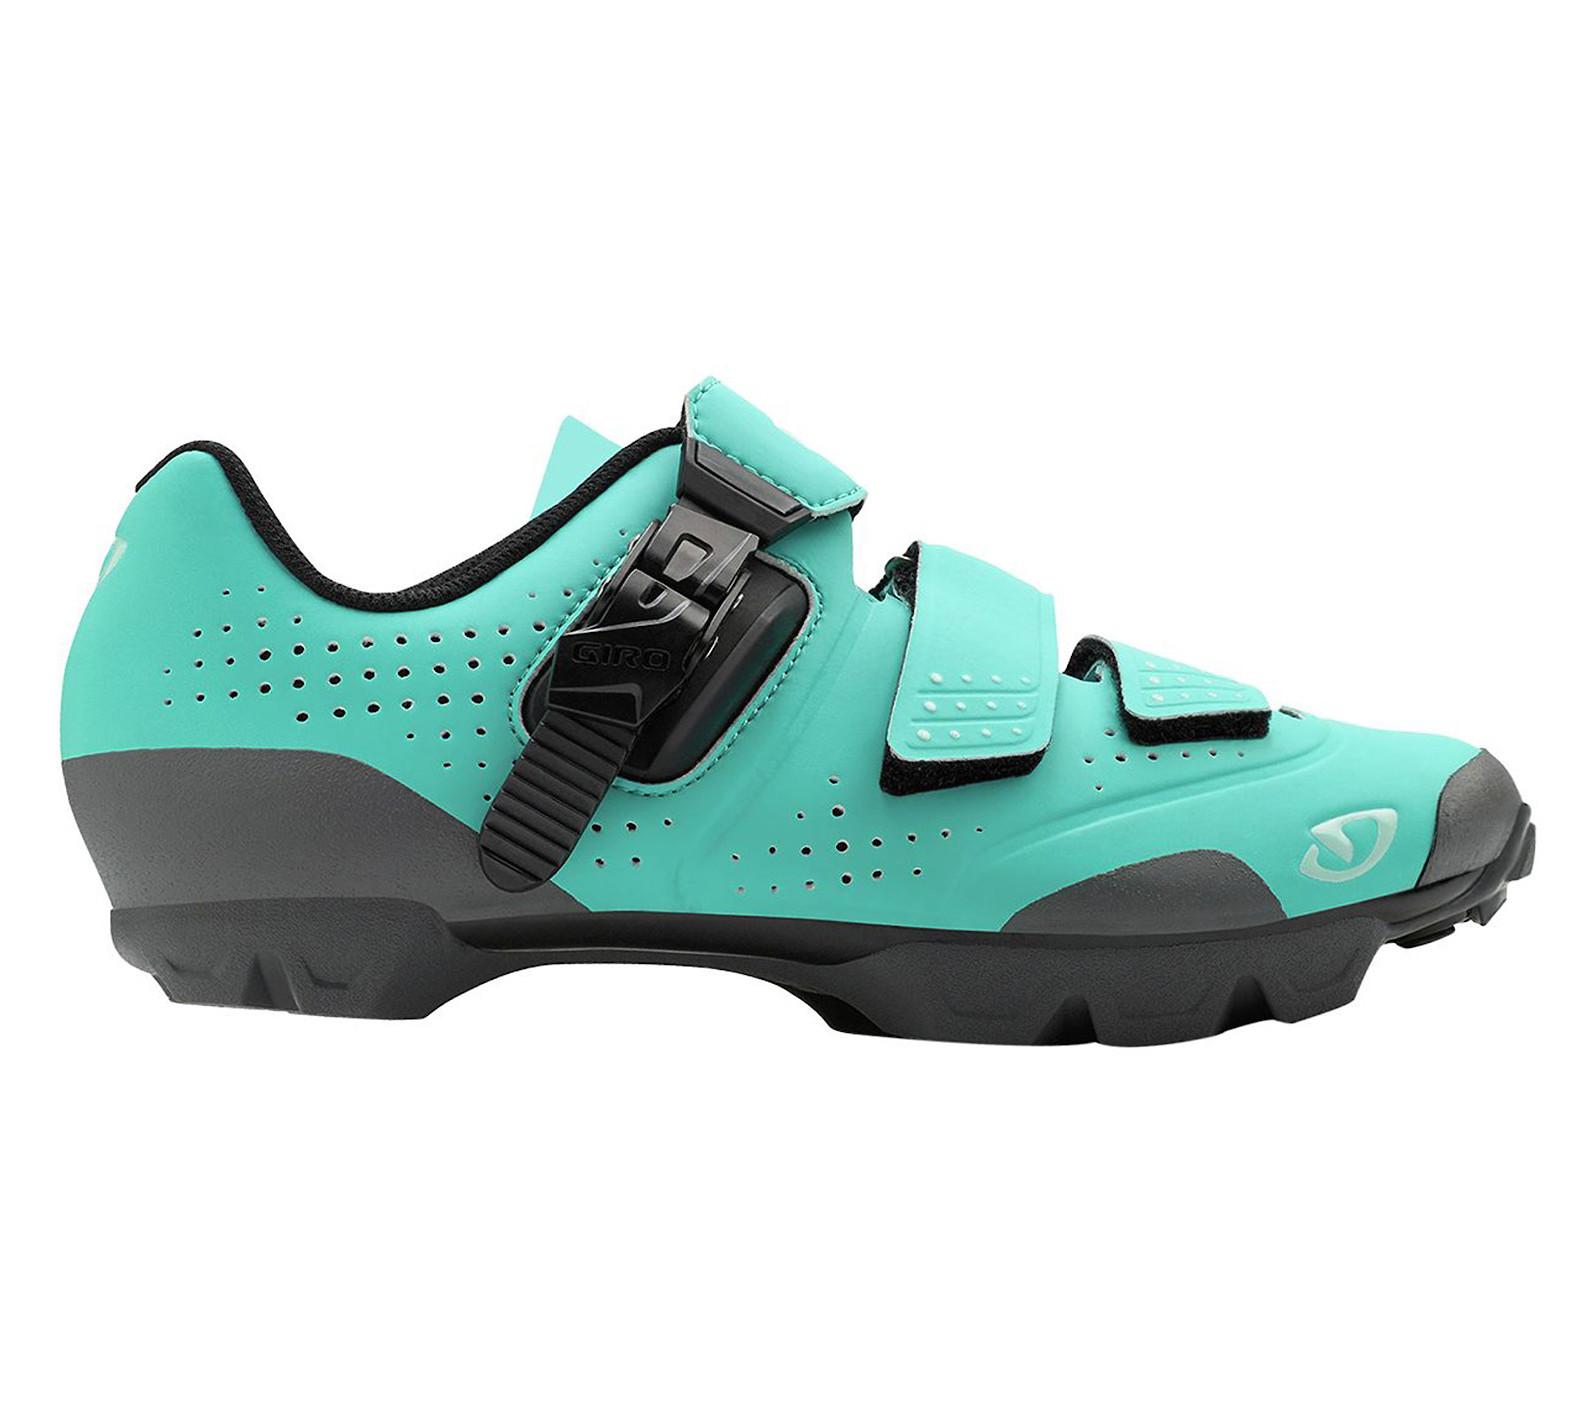 Giro Manta R women's shoe in glacier-titanium